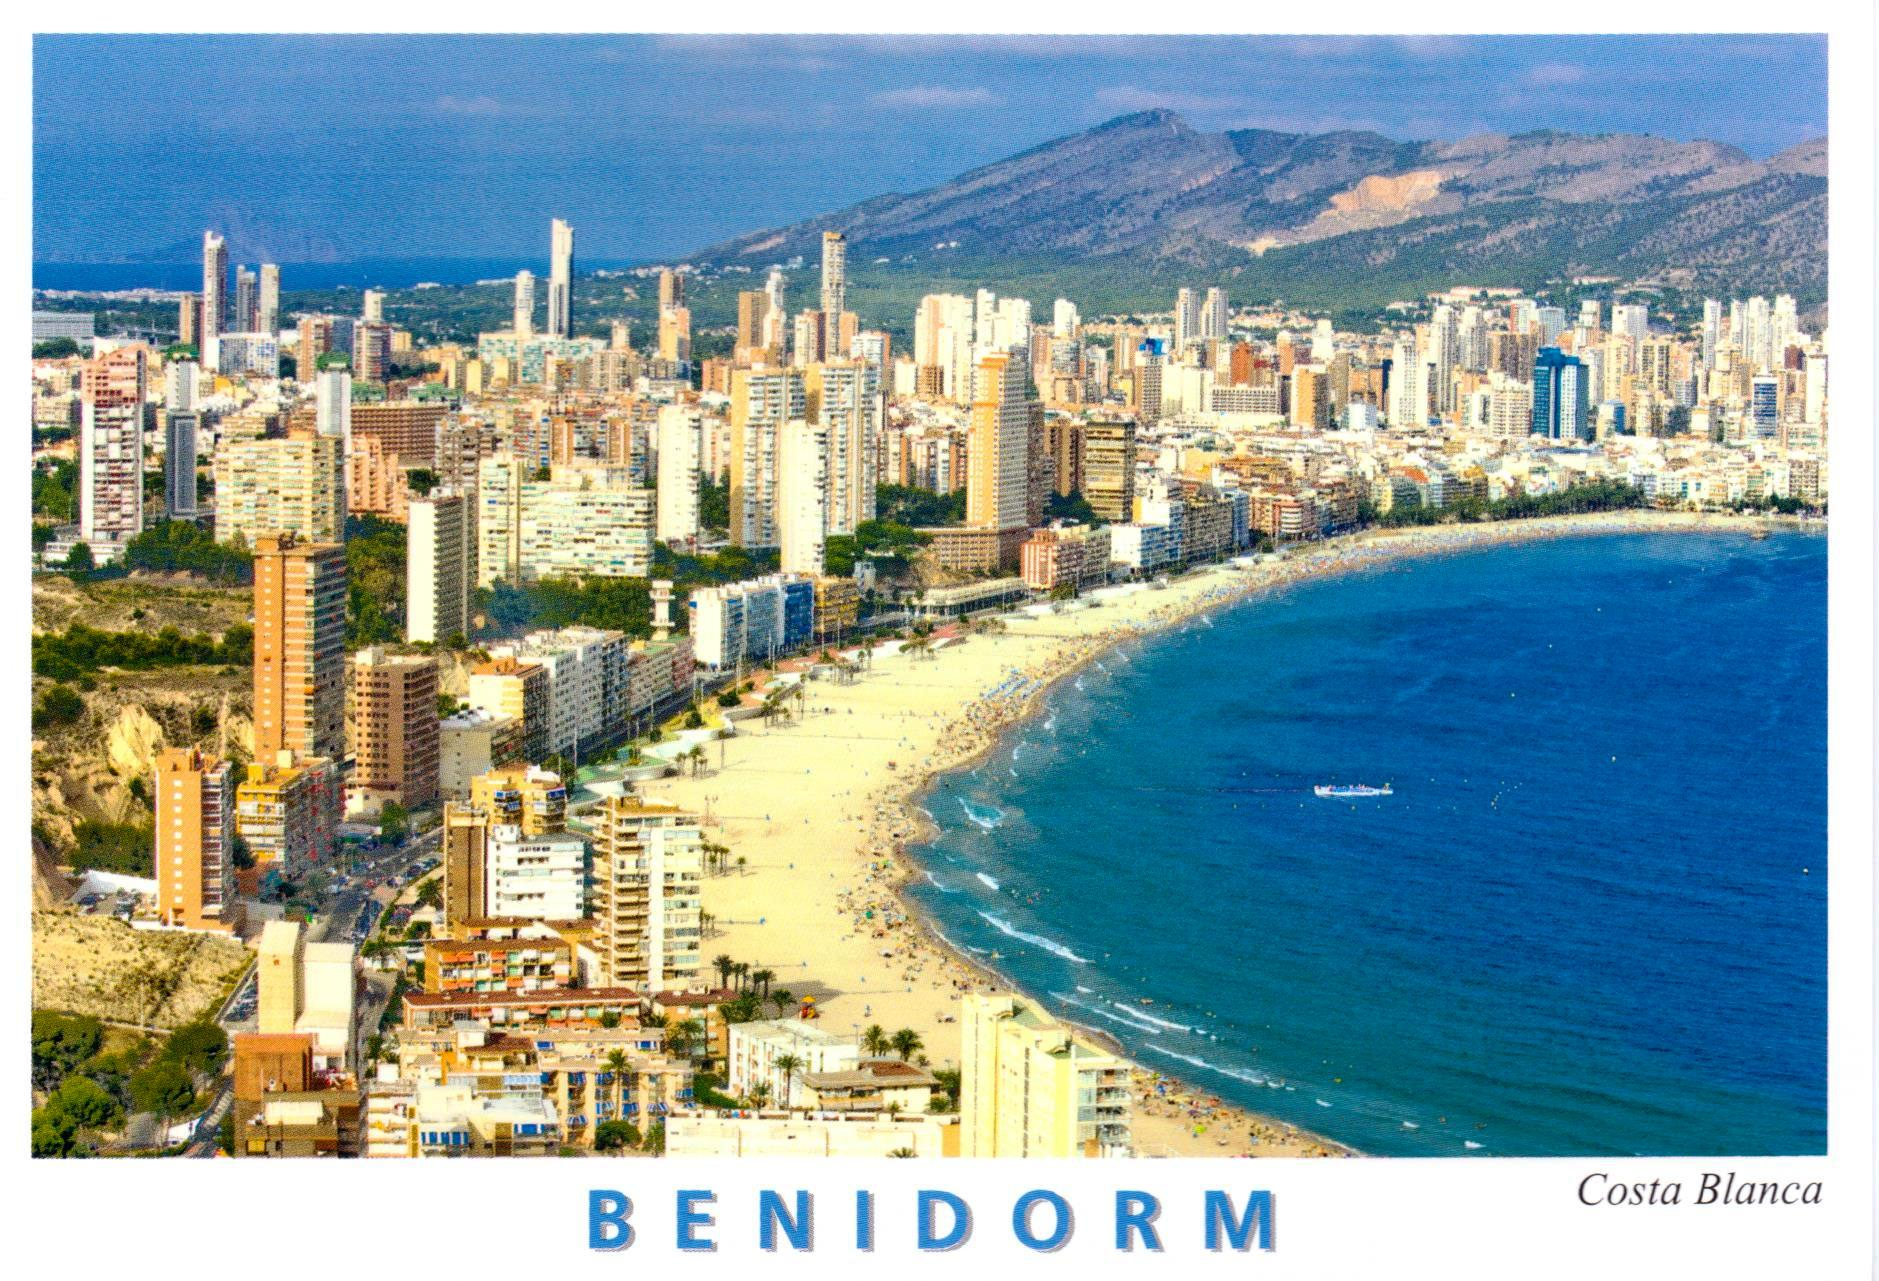 Benidorm Spain  city photos gallery : Benidorm | Have Bag, Will Travel | Page 2